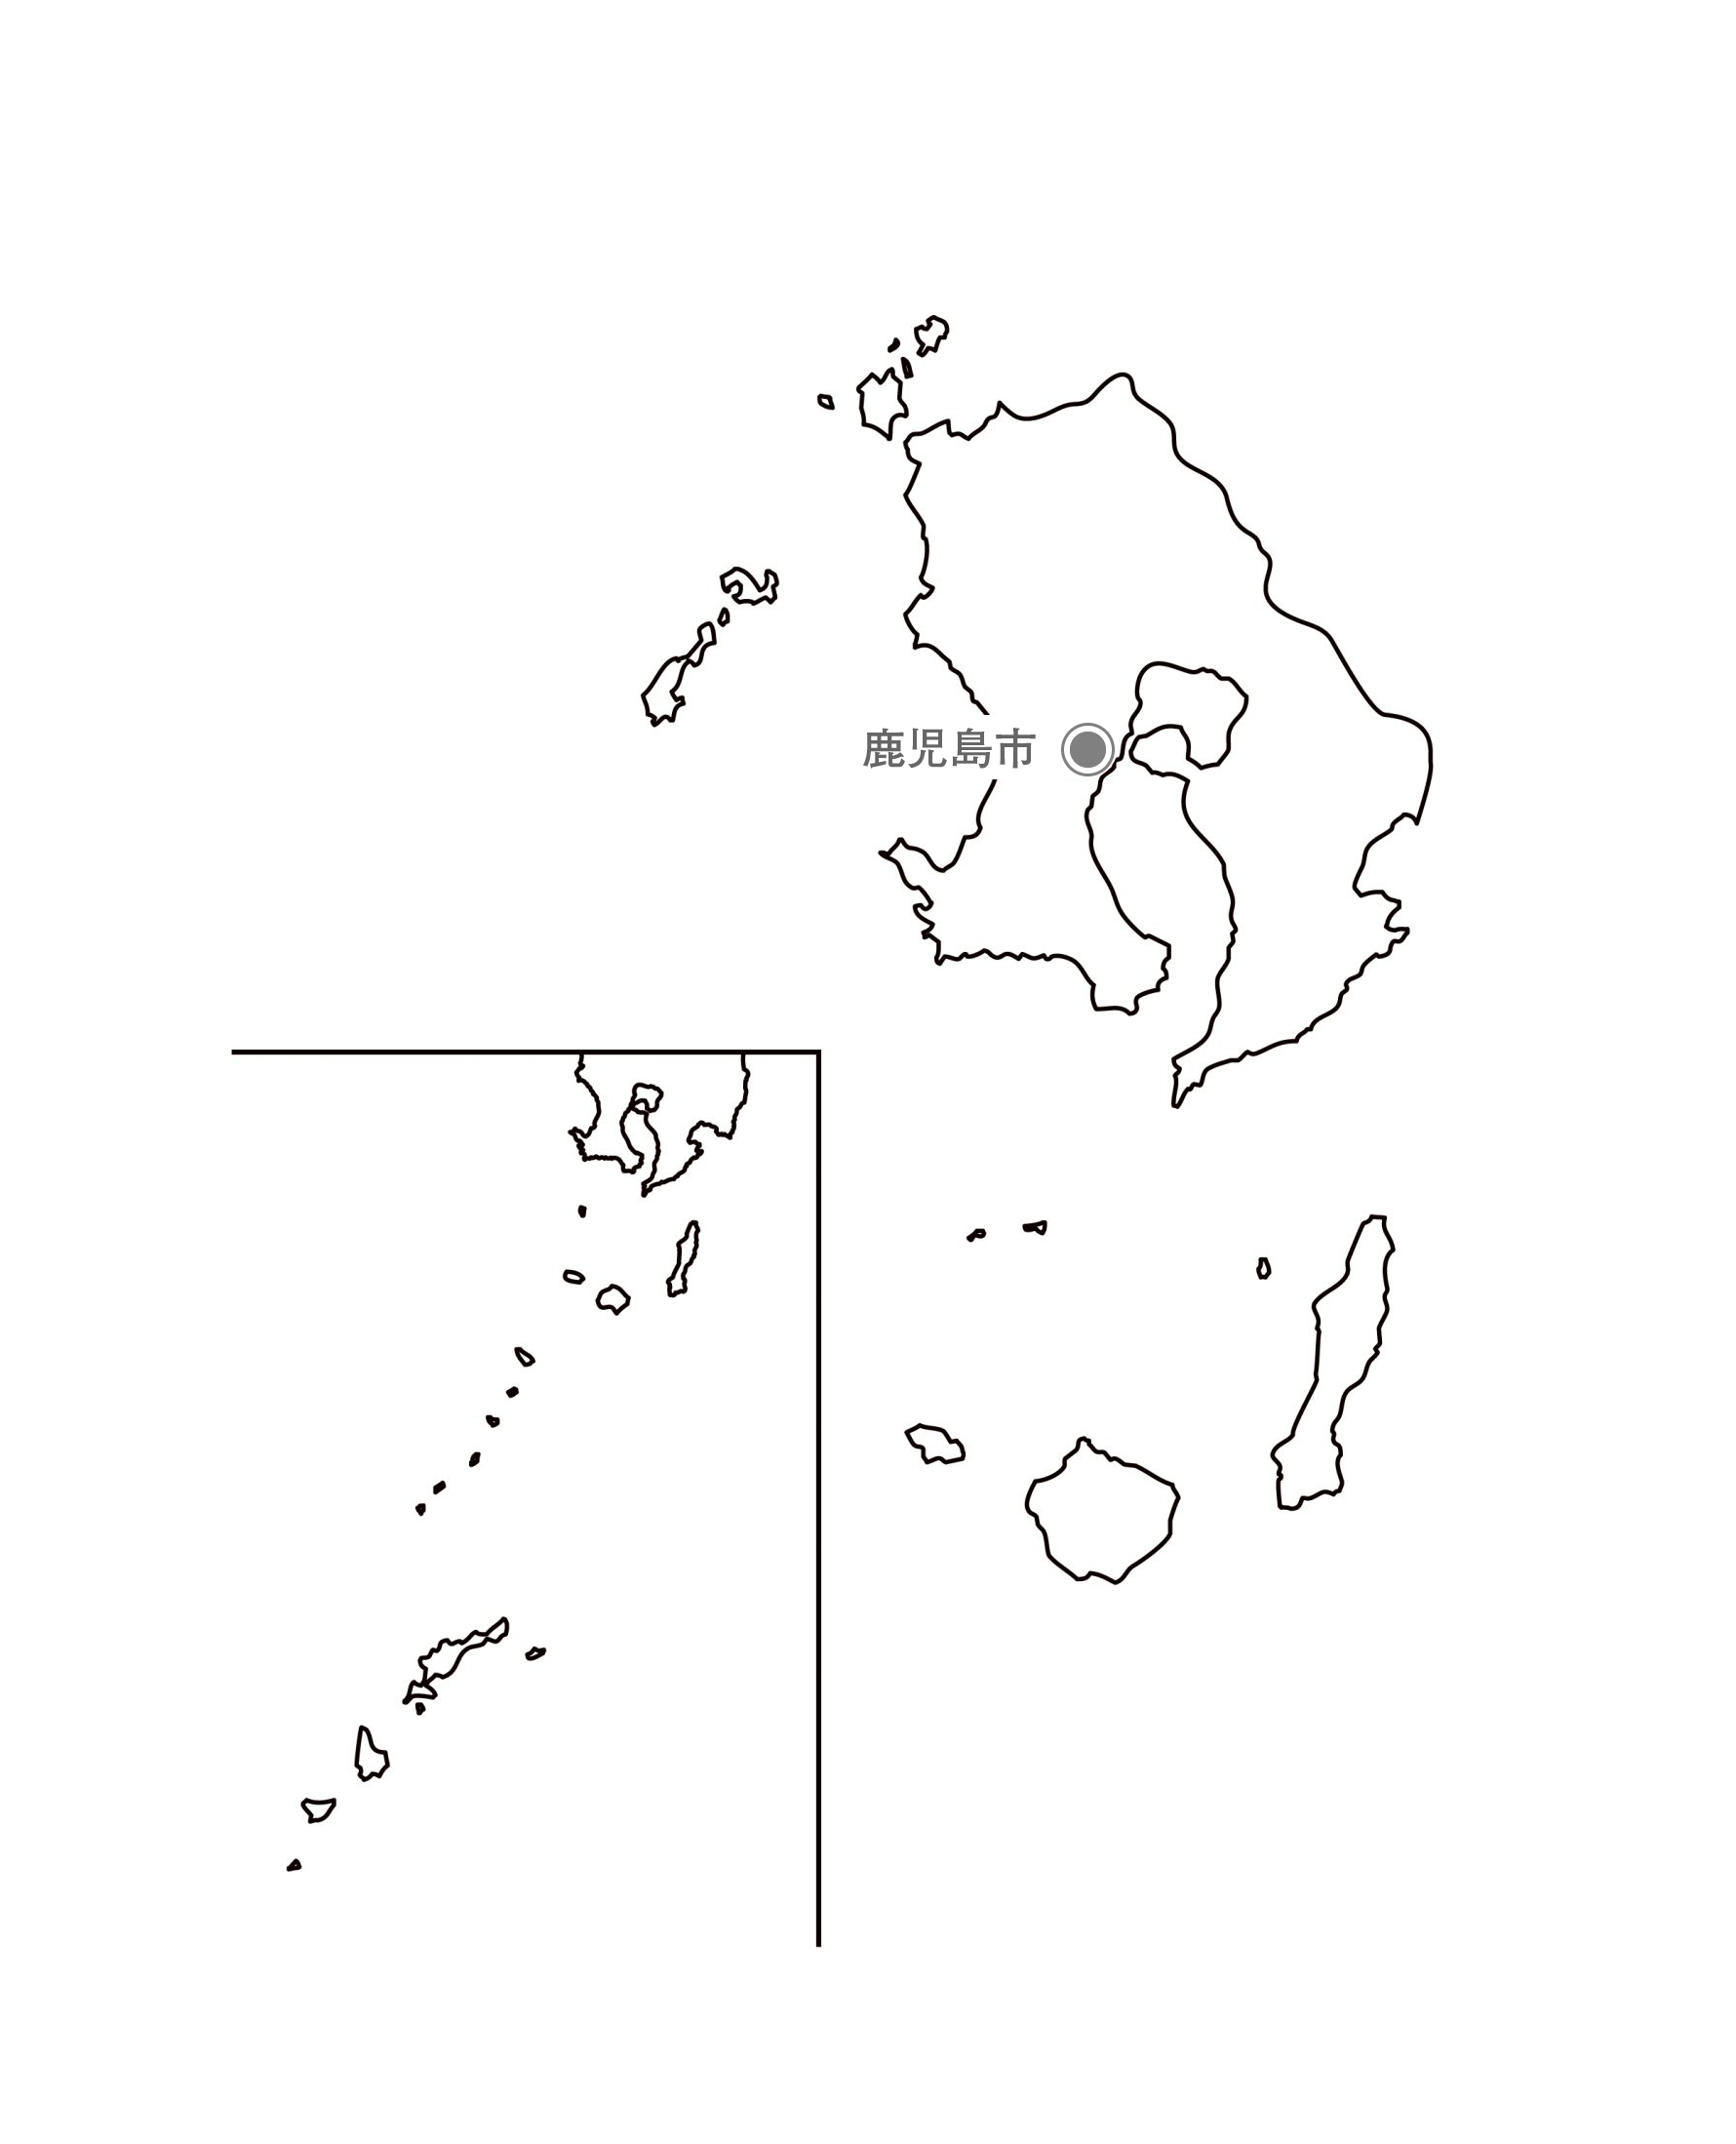 [白地図]鹿児島県・都道府県名・県庁所在地あり